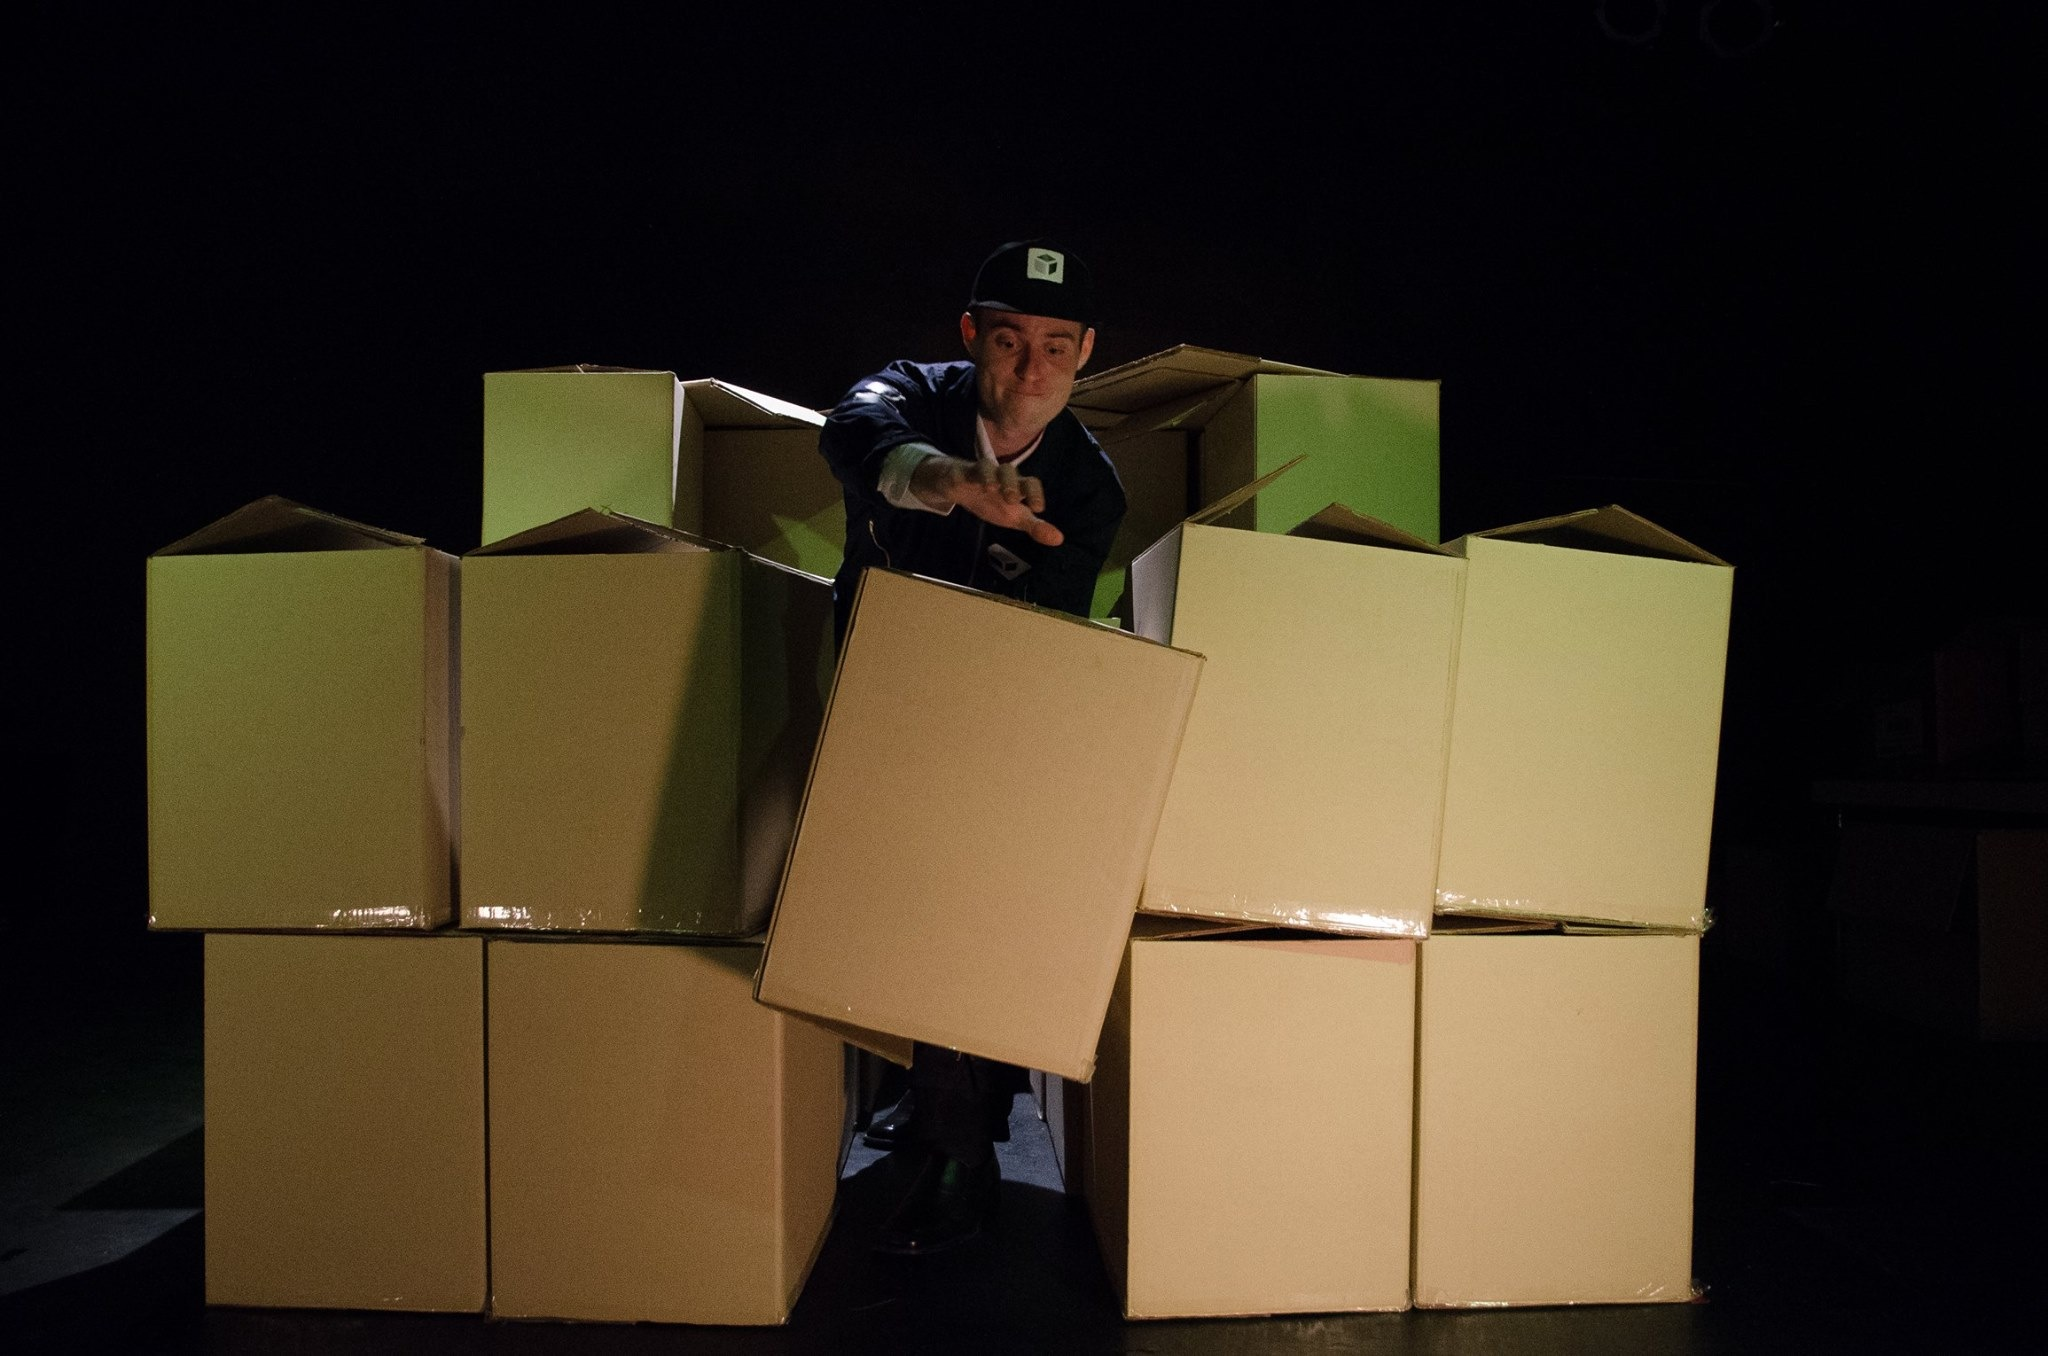 Boxes 4.jpeg